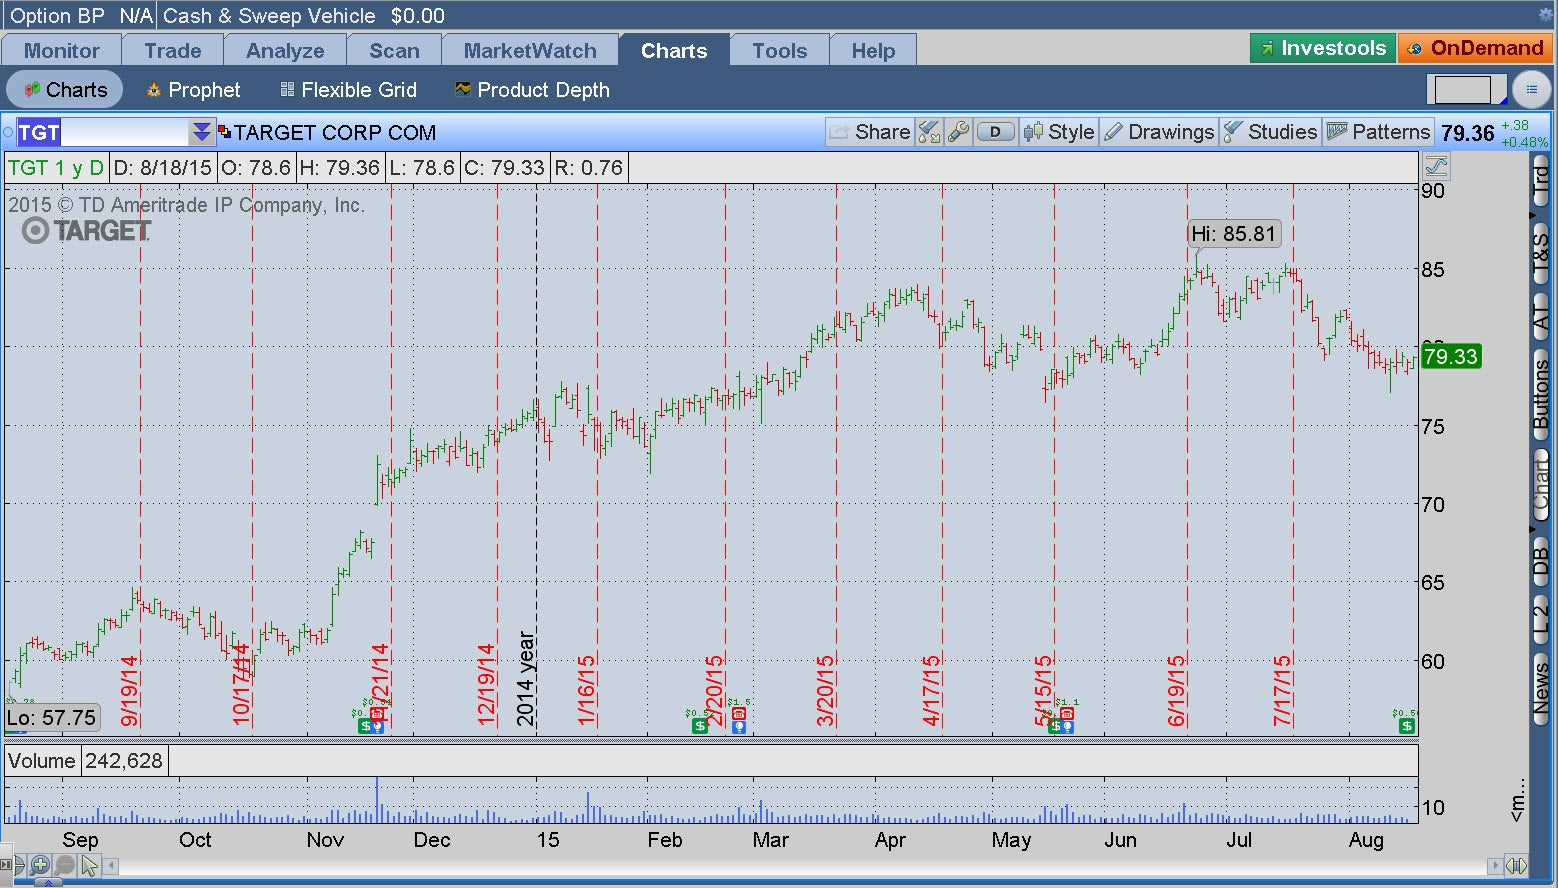 High performance options trading option volatility & pricing strategies pdf